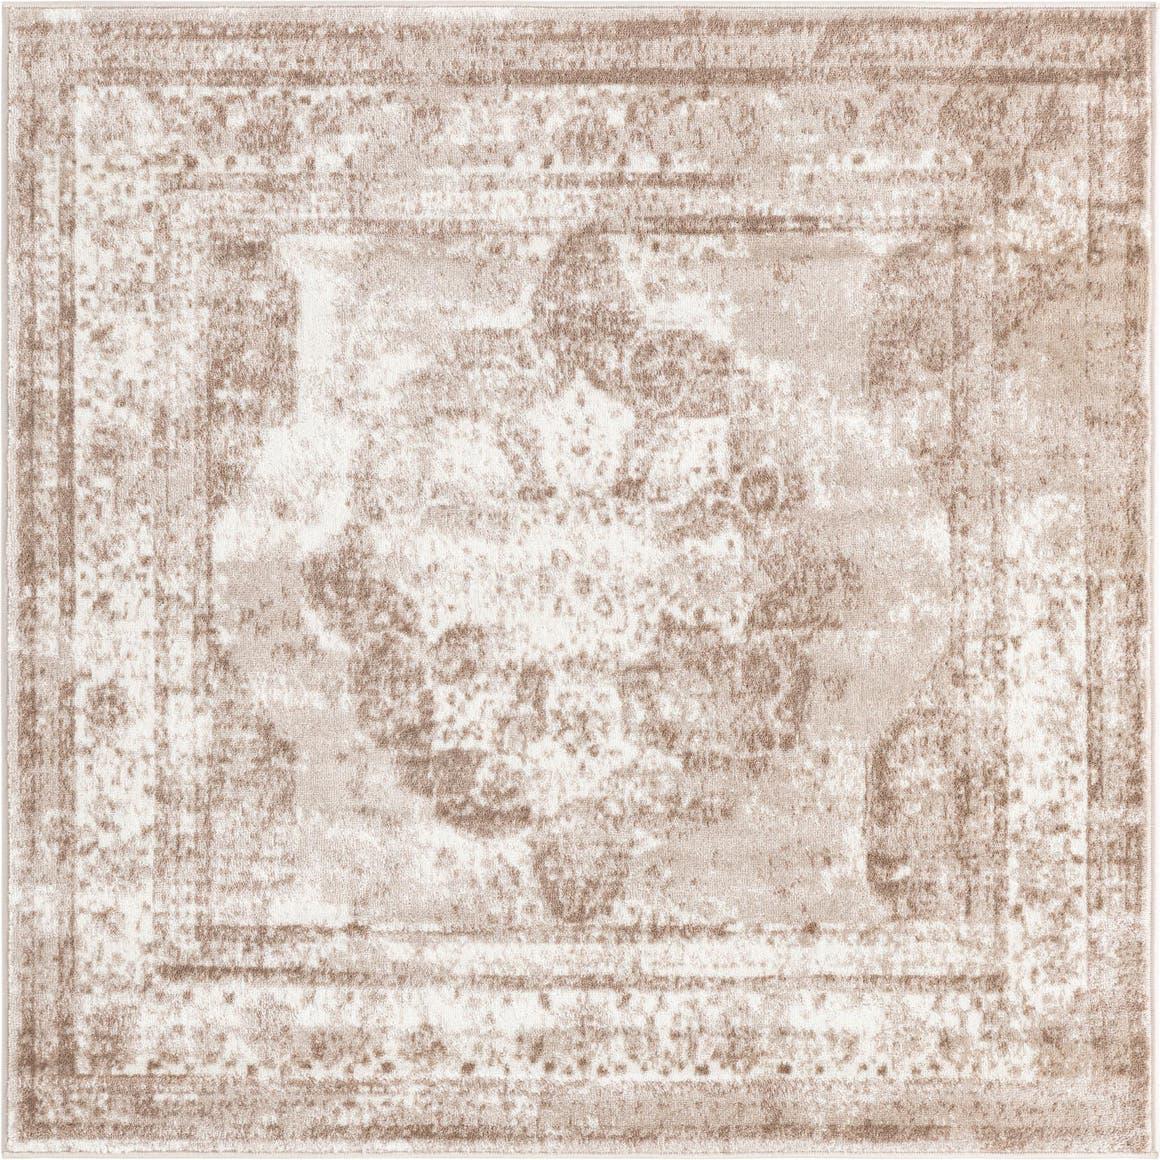 5' x 5' Monaco Square Rug main image